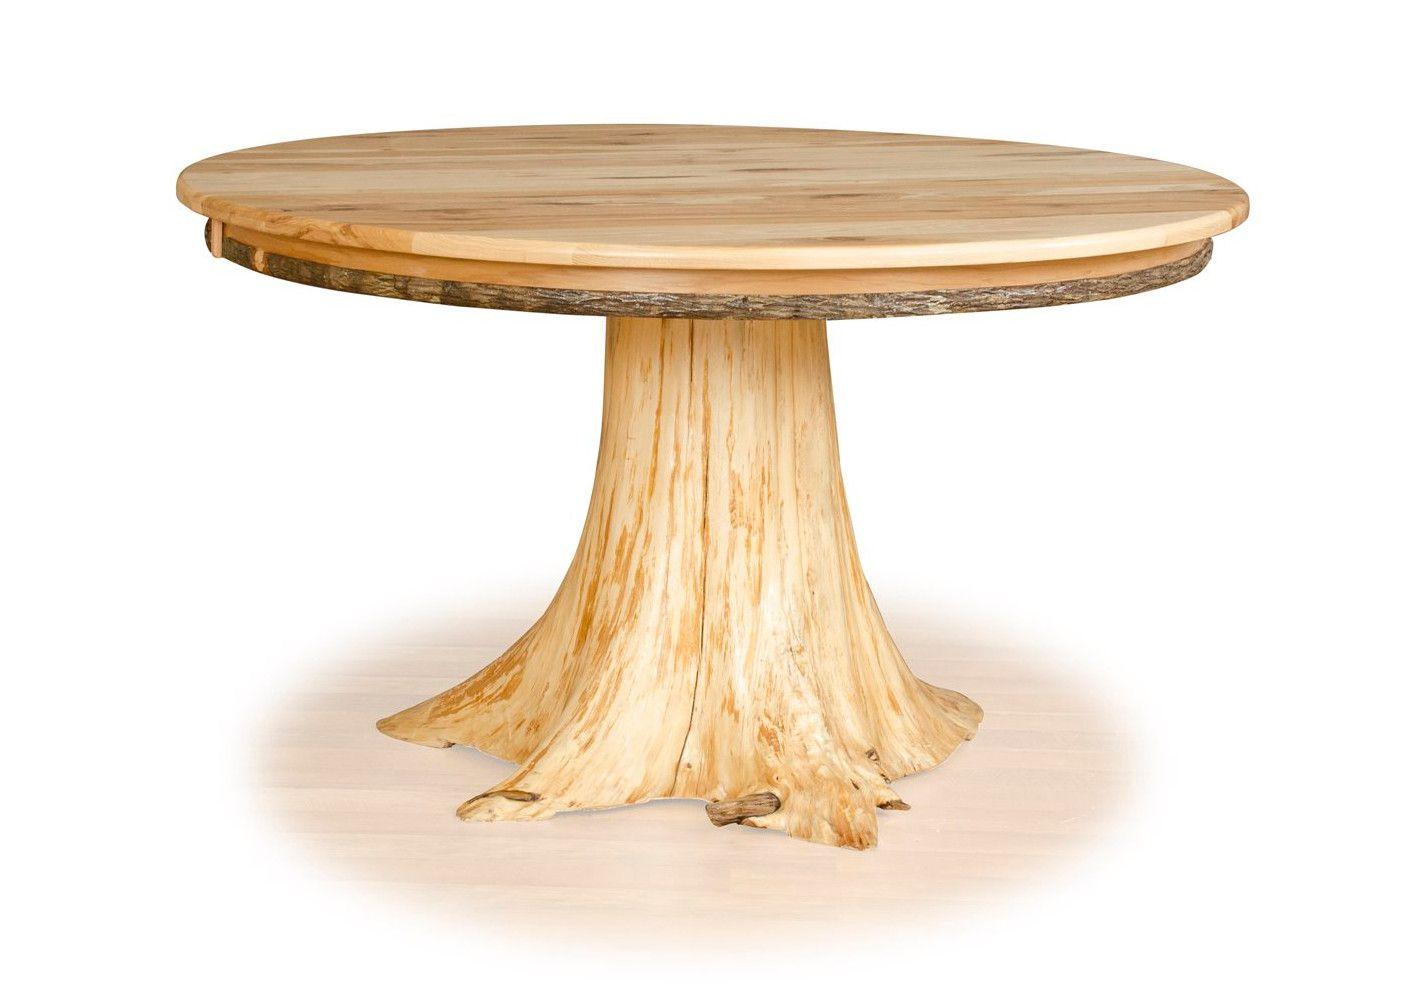 Custom White Cedar Stump Table with Live Edge Hickory Top | Stump ...